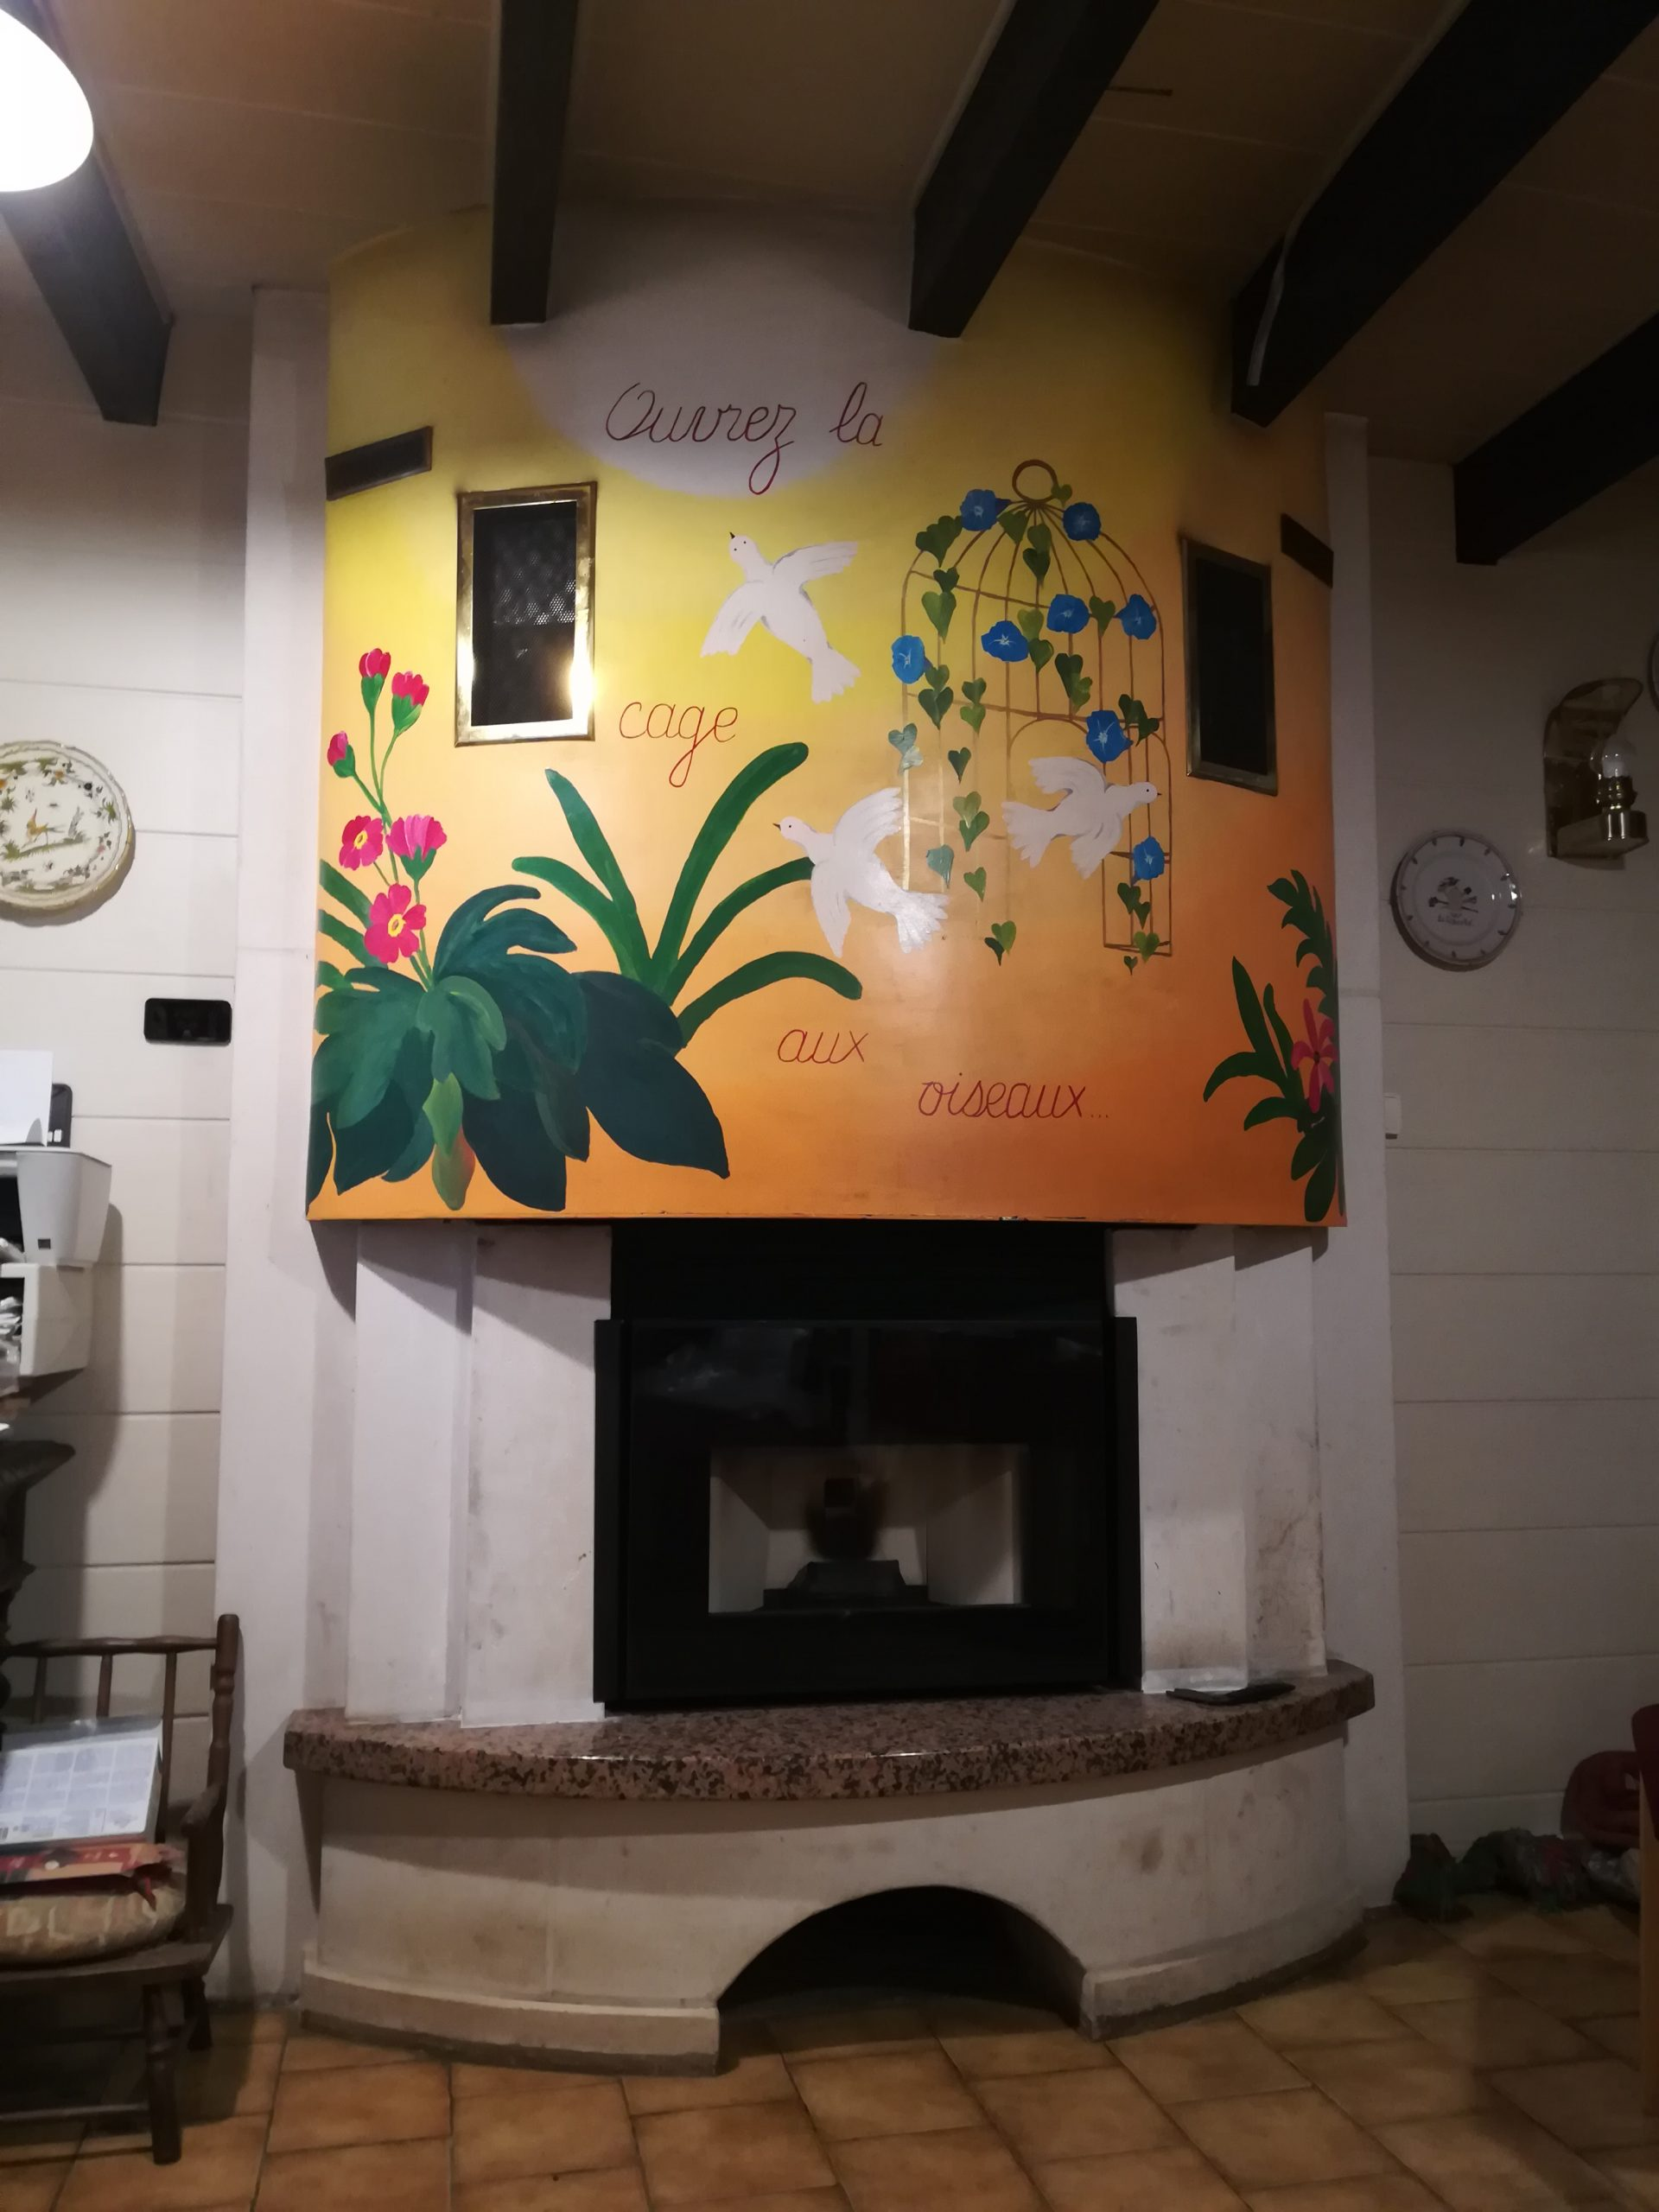 installation chauffage et inserts en creuse guéret aubusson bonnat scaled - Galerie Chauffage / Plomberie